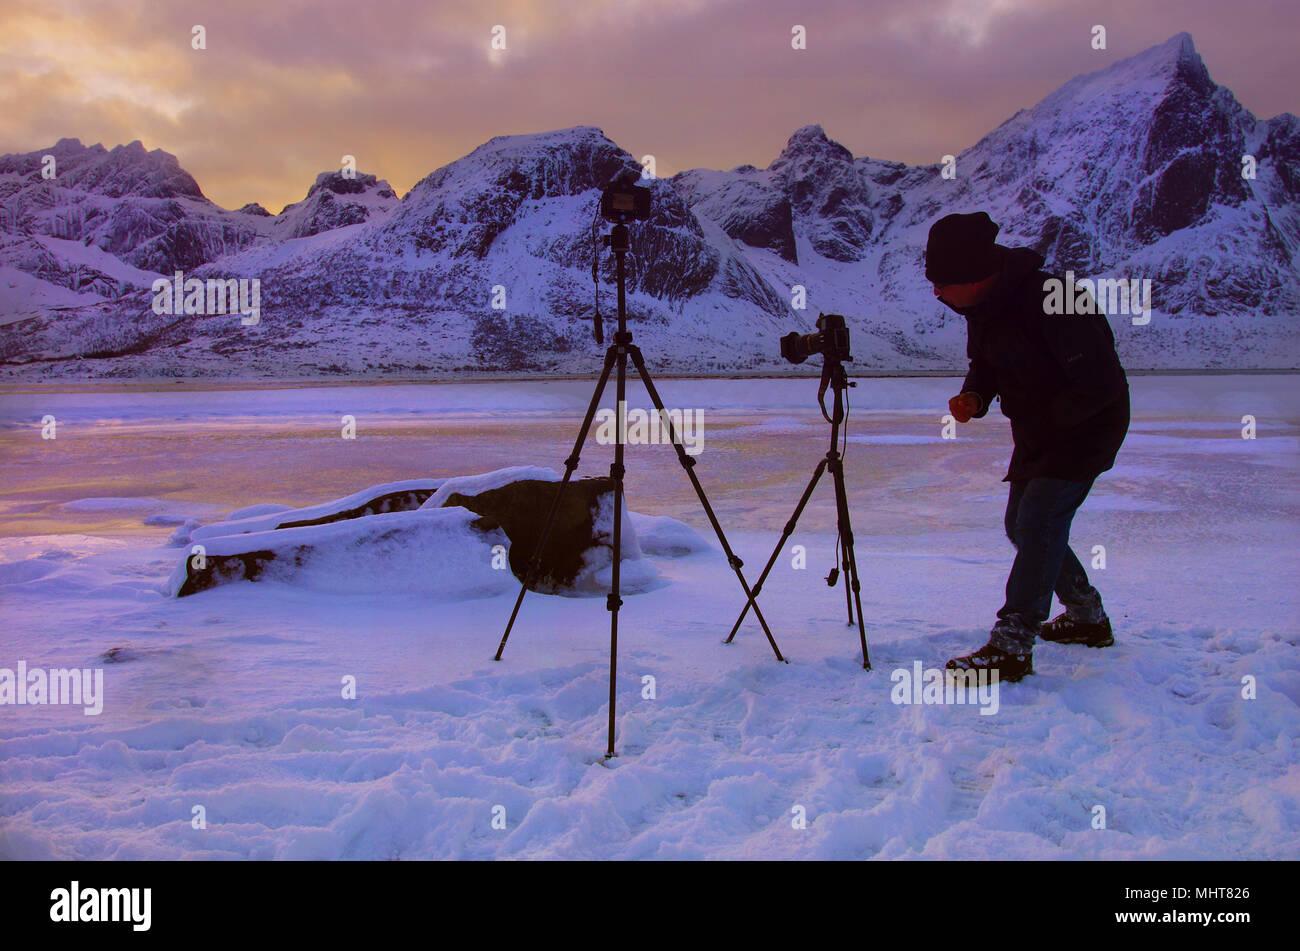 North pole - Stock Image